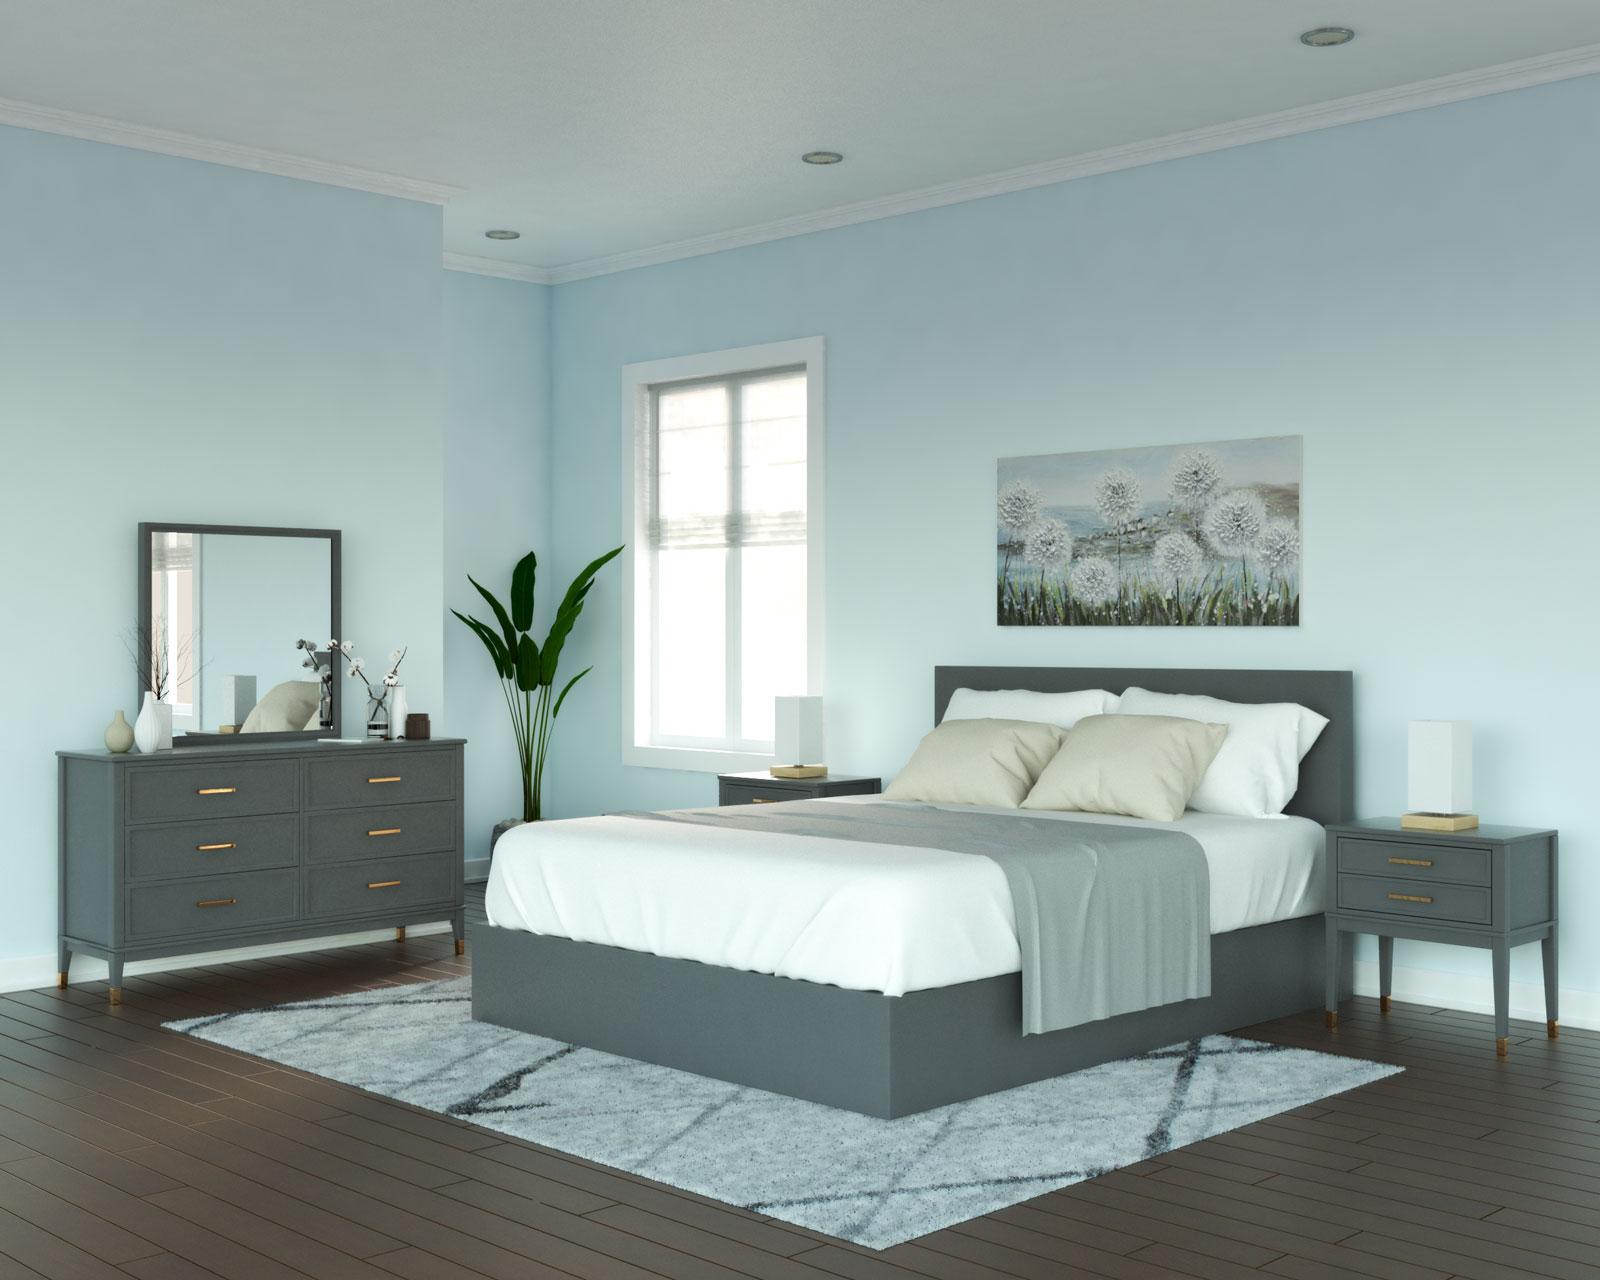 Sky blue and gray bedroom ideas